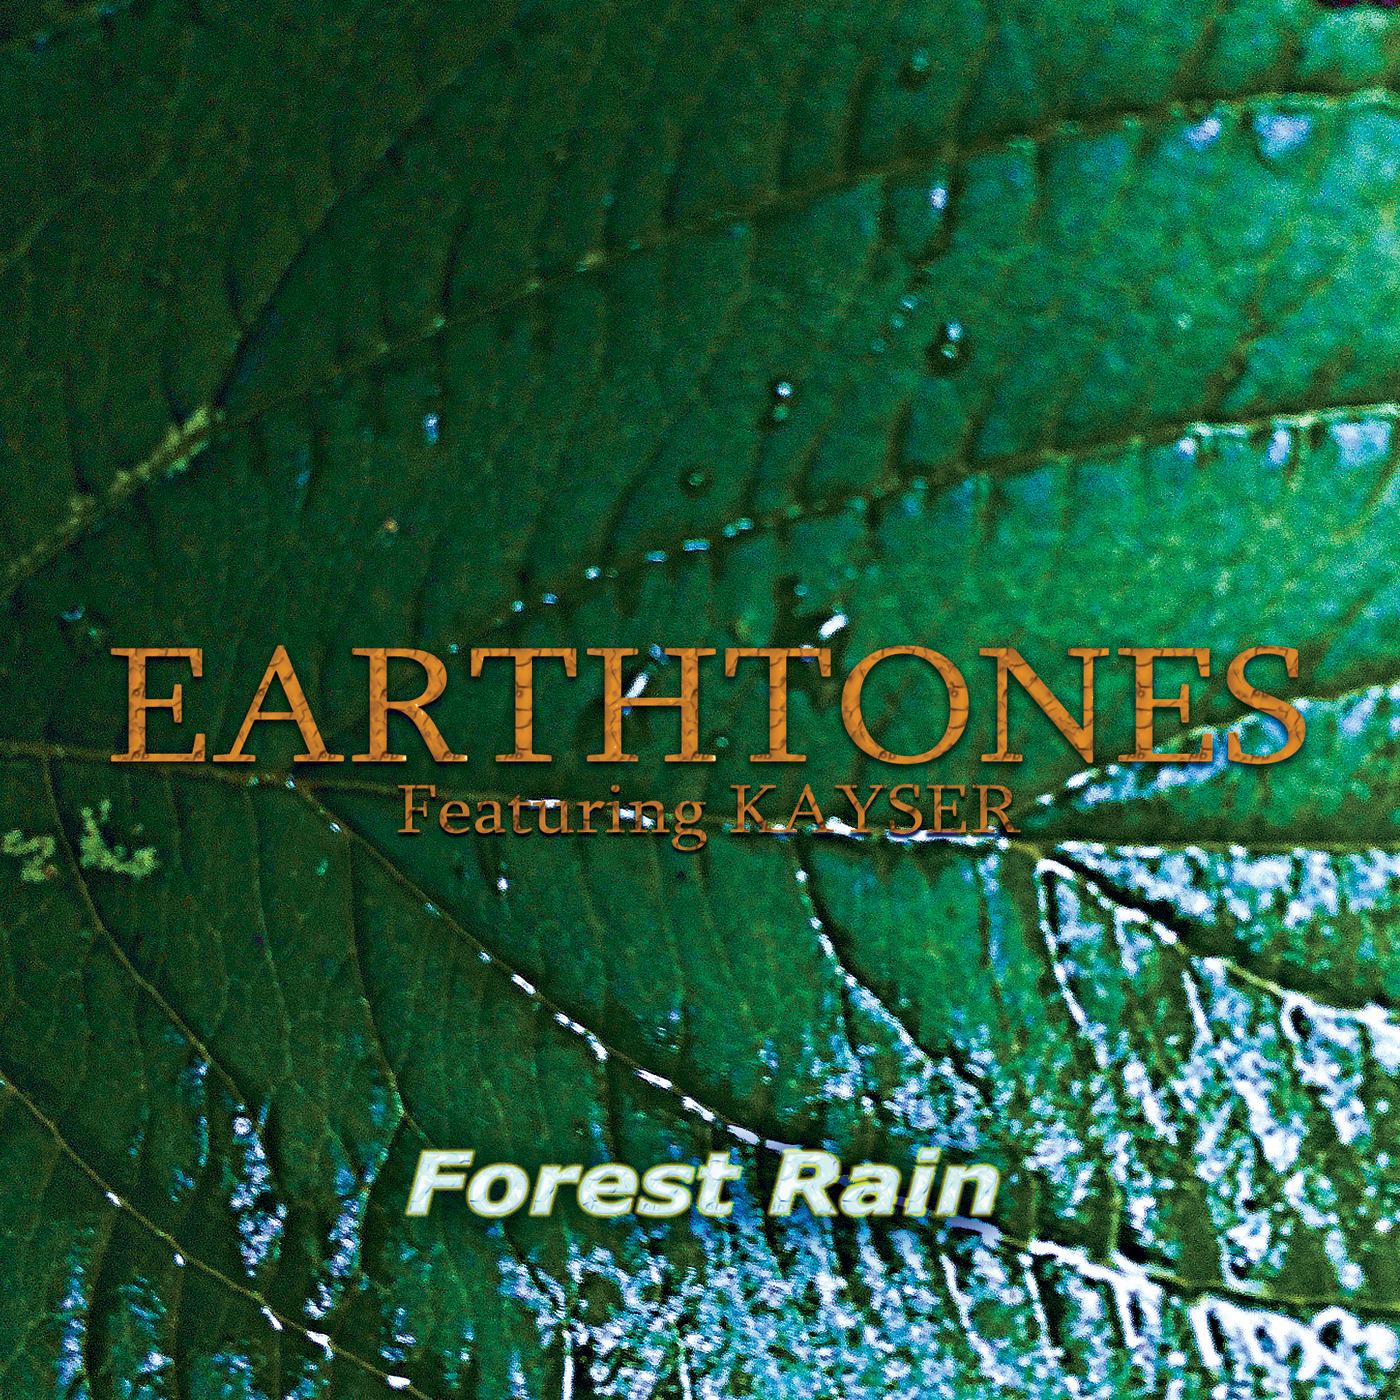 Earthtones-Forest Rain (Album cover) cdbaby